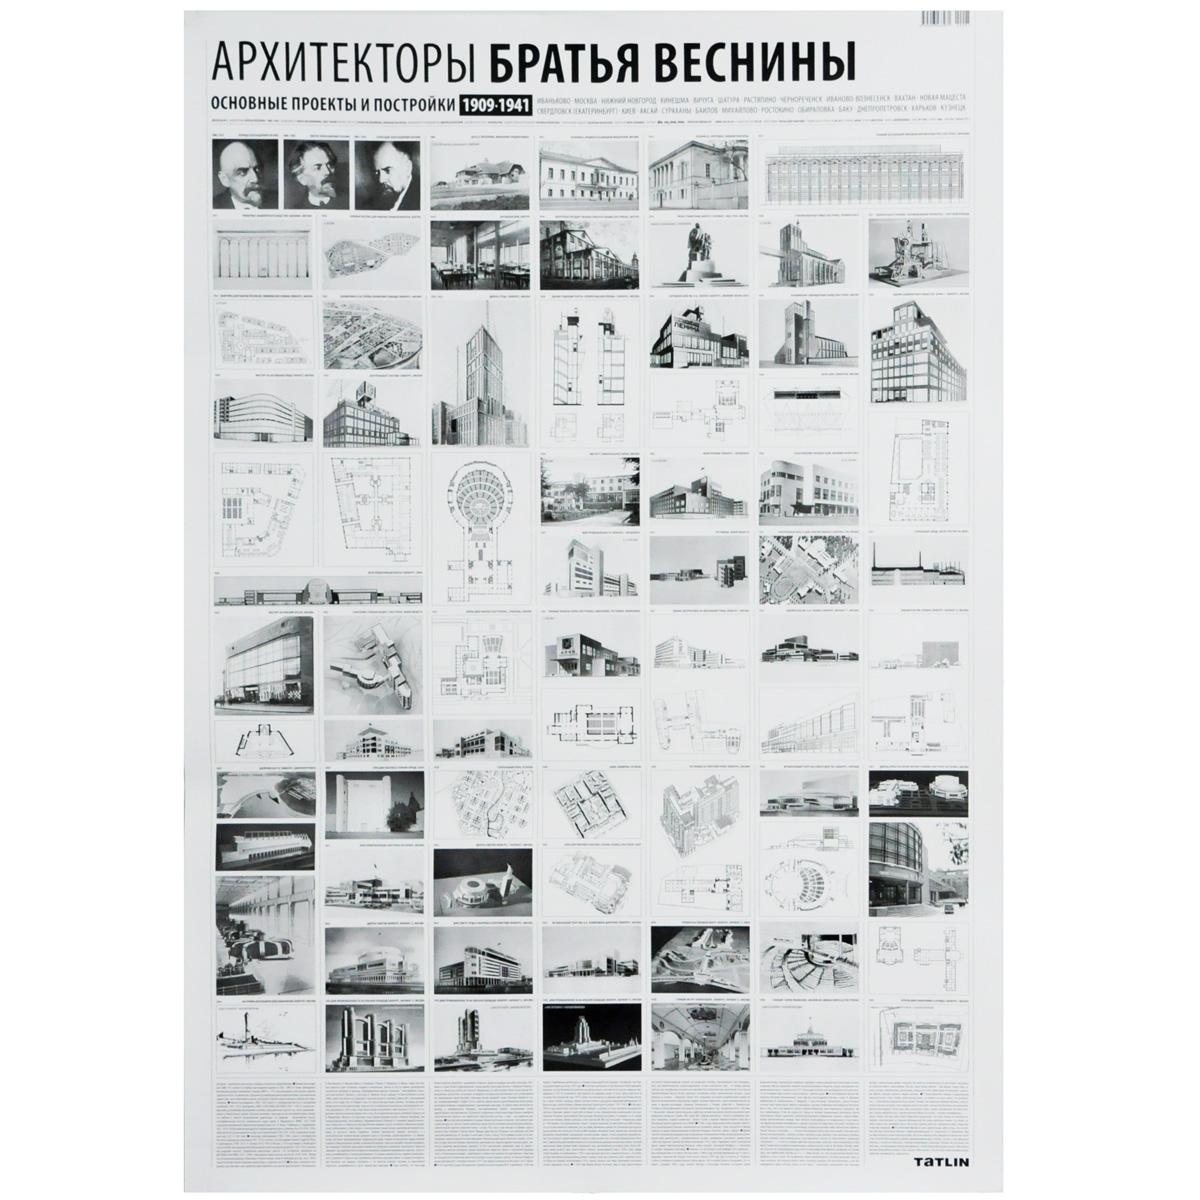 Archilog №3. Архитекторы Братья Веснины. 1909-1941. Плакат